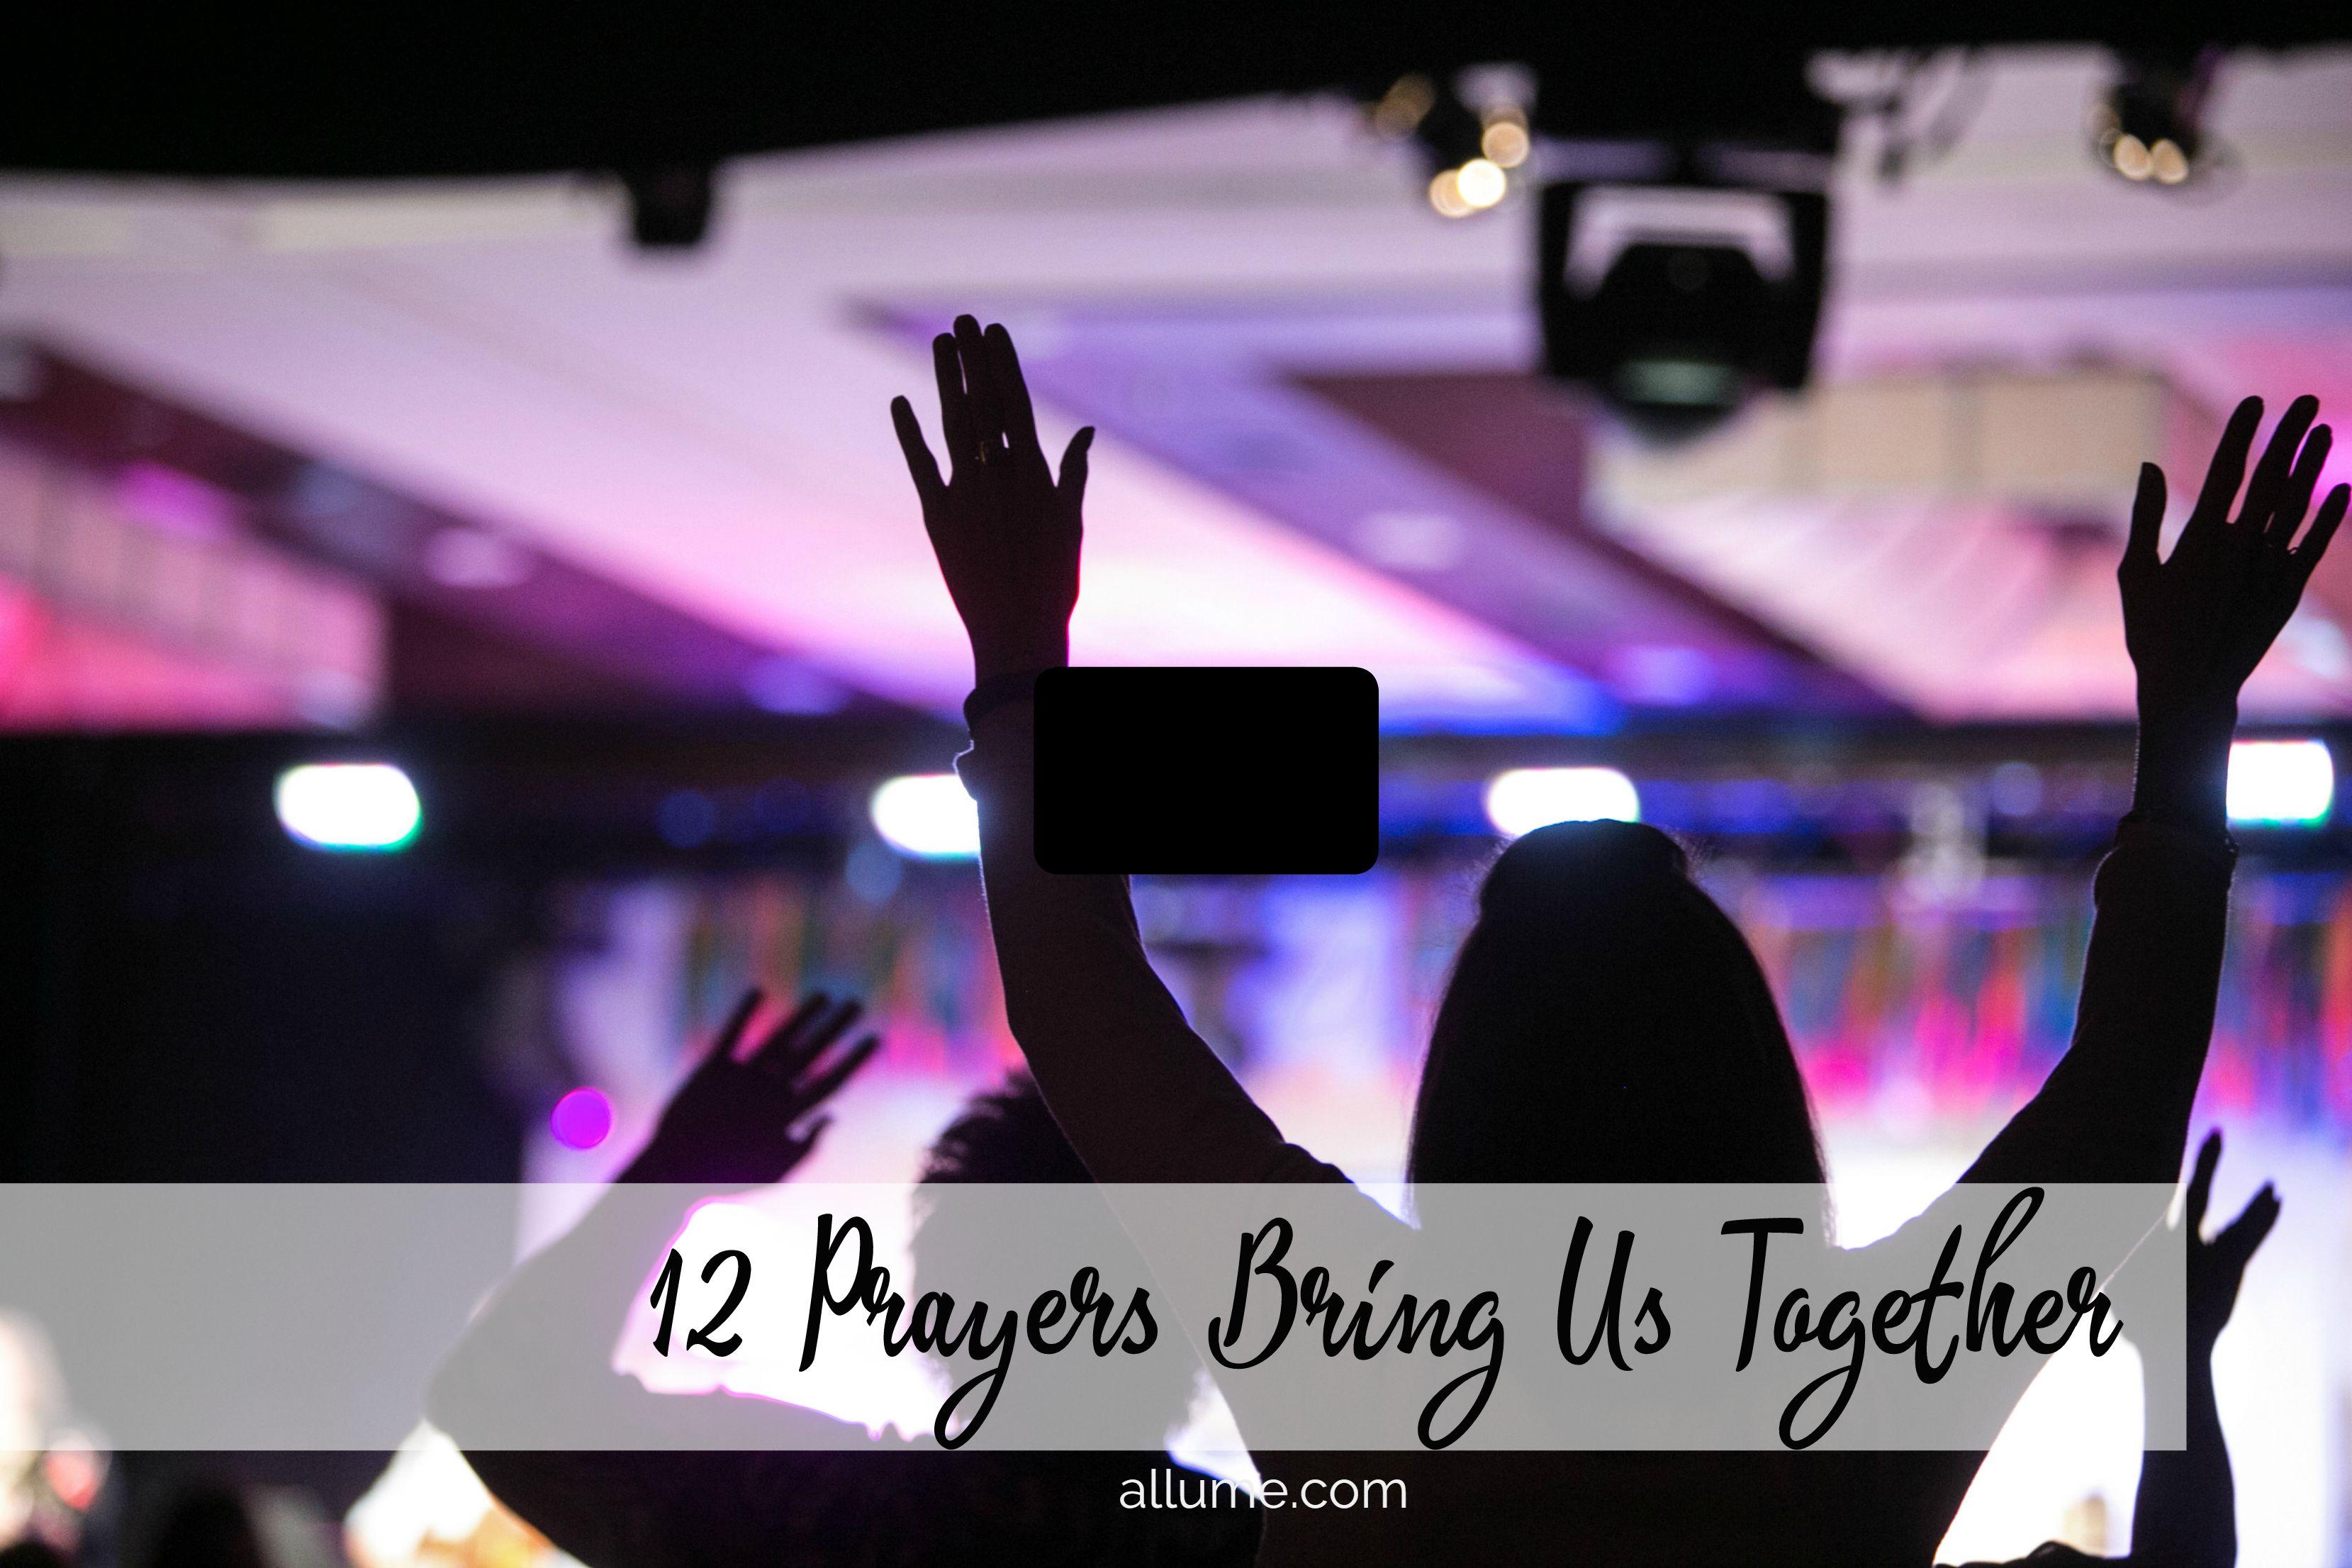 prayer 1.2